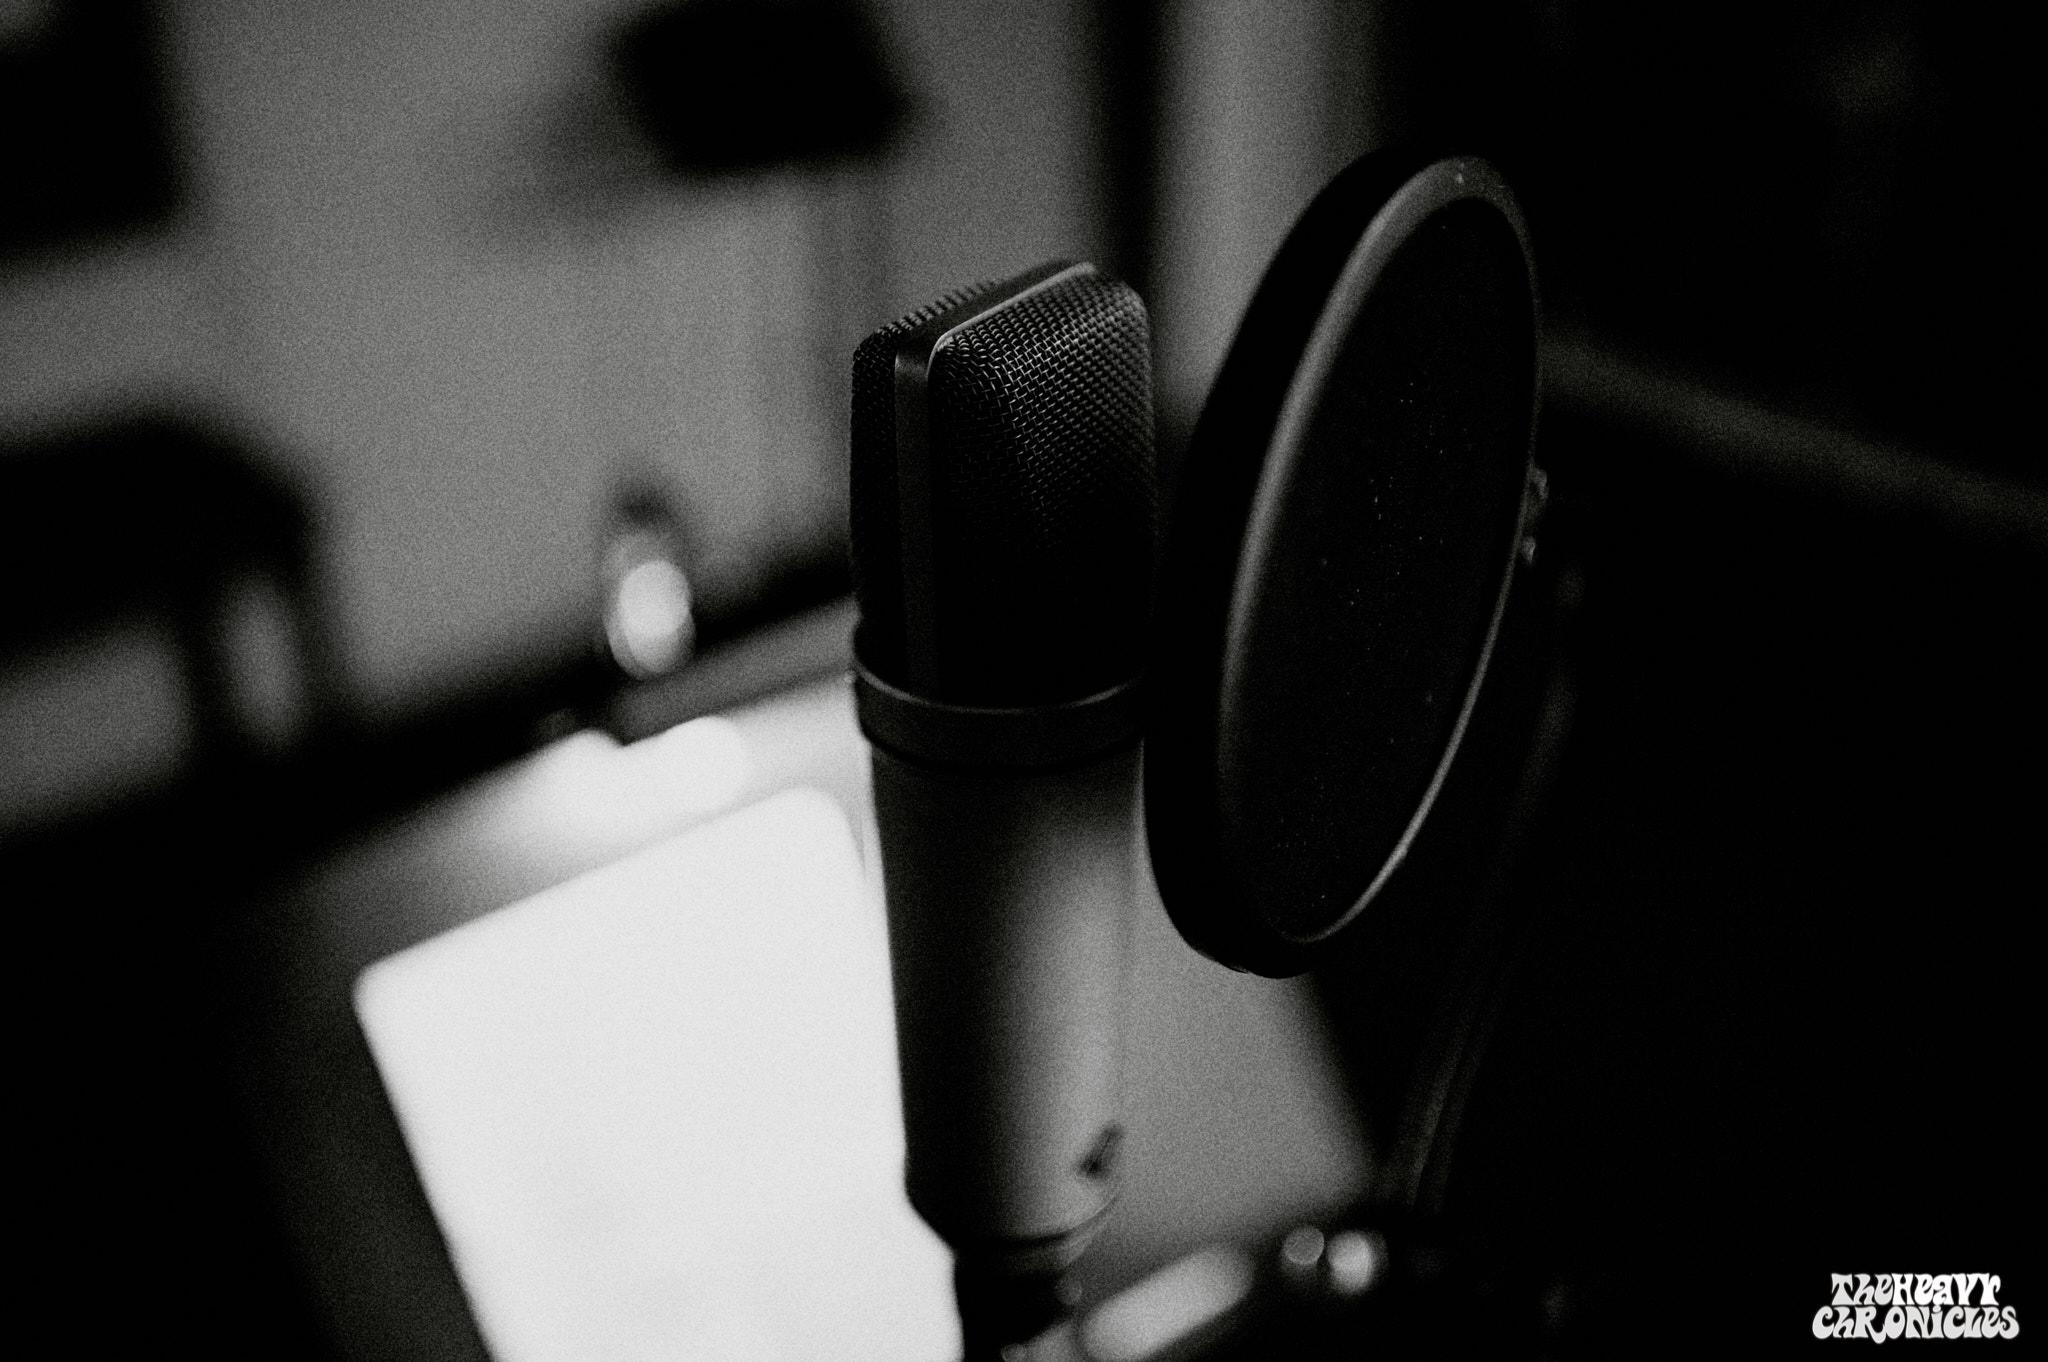 Elder-Studio-Black-Box-2019-Gael-Mathieu-The-Heavy-Chronicles-54